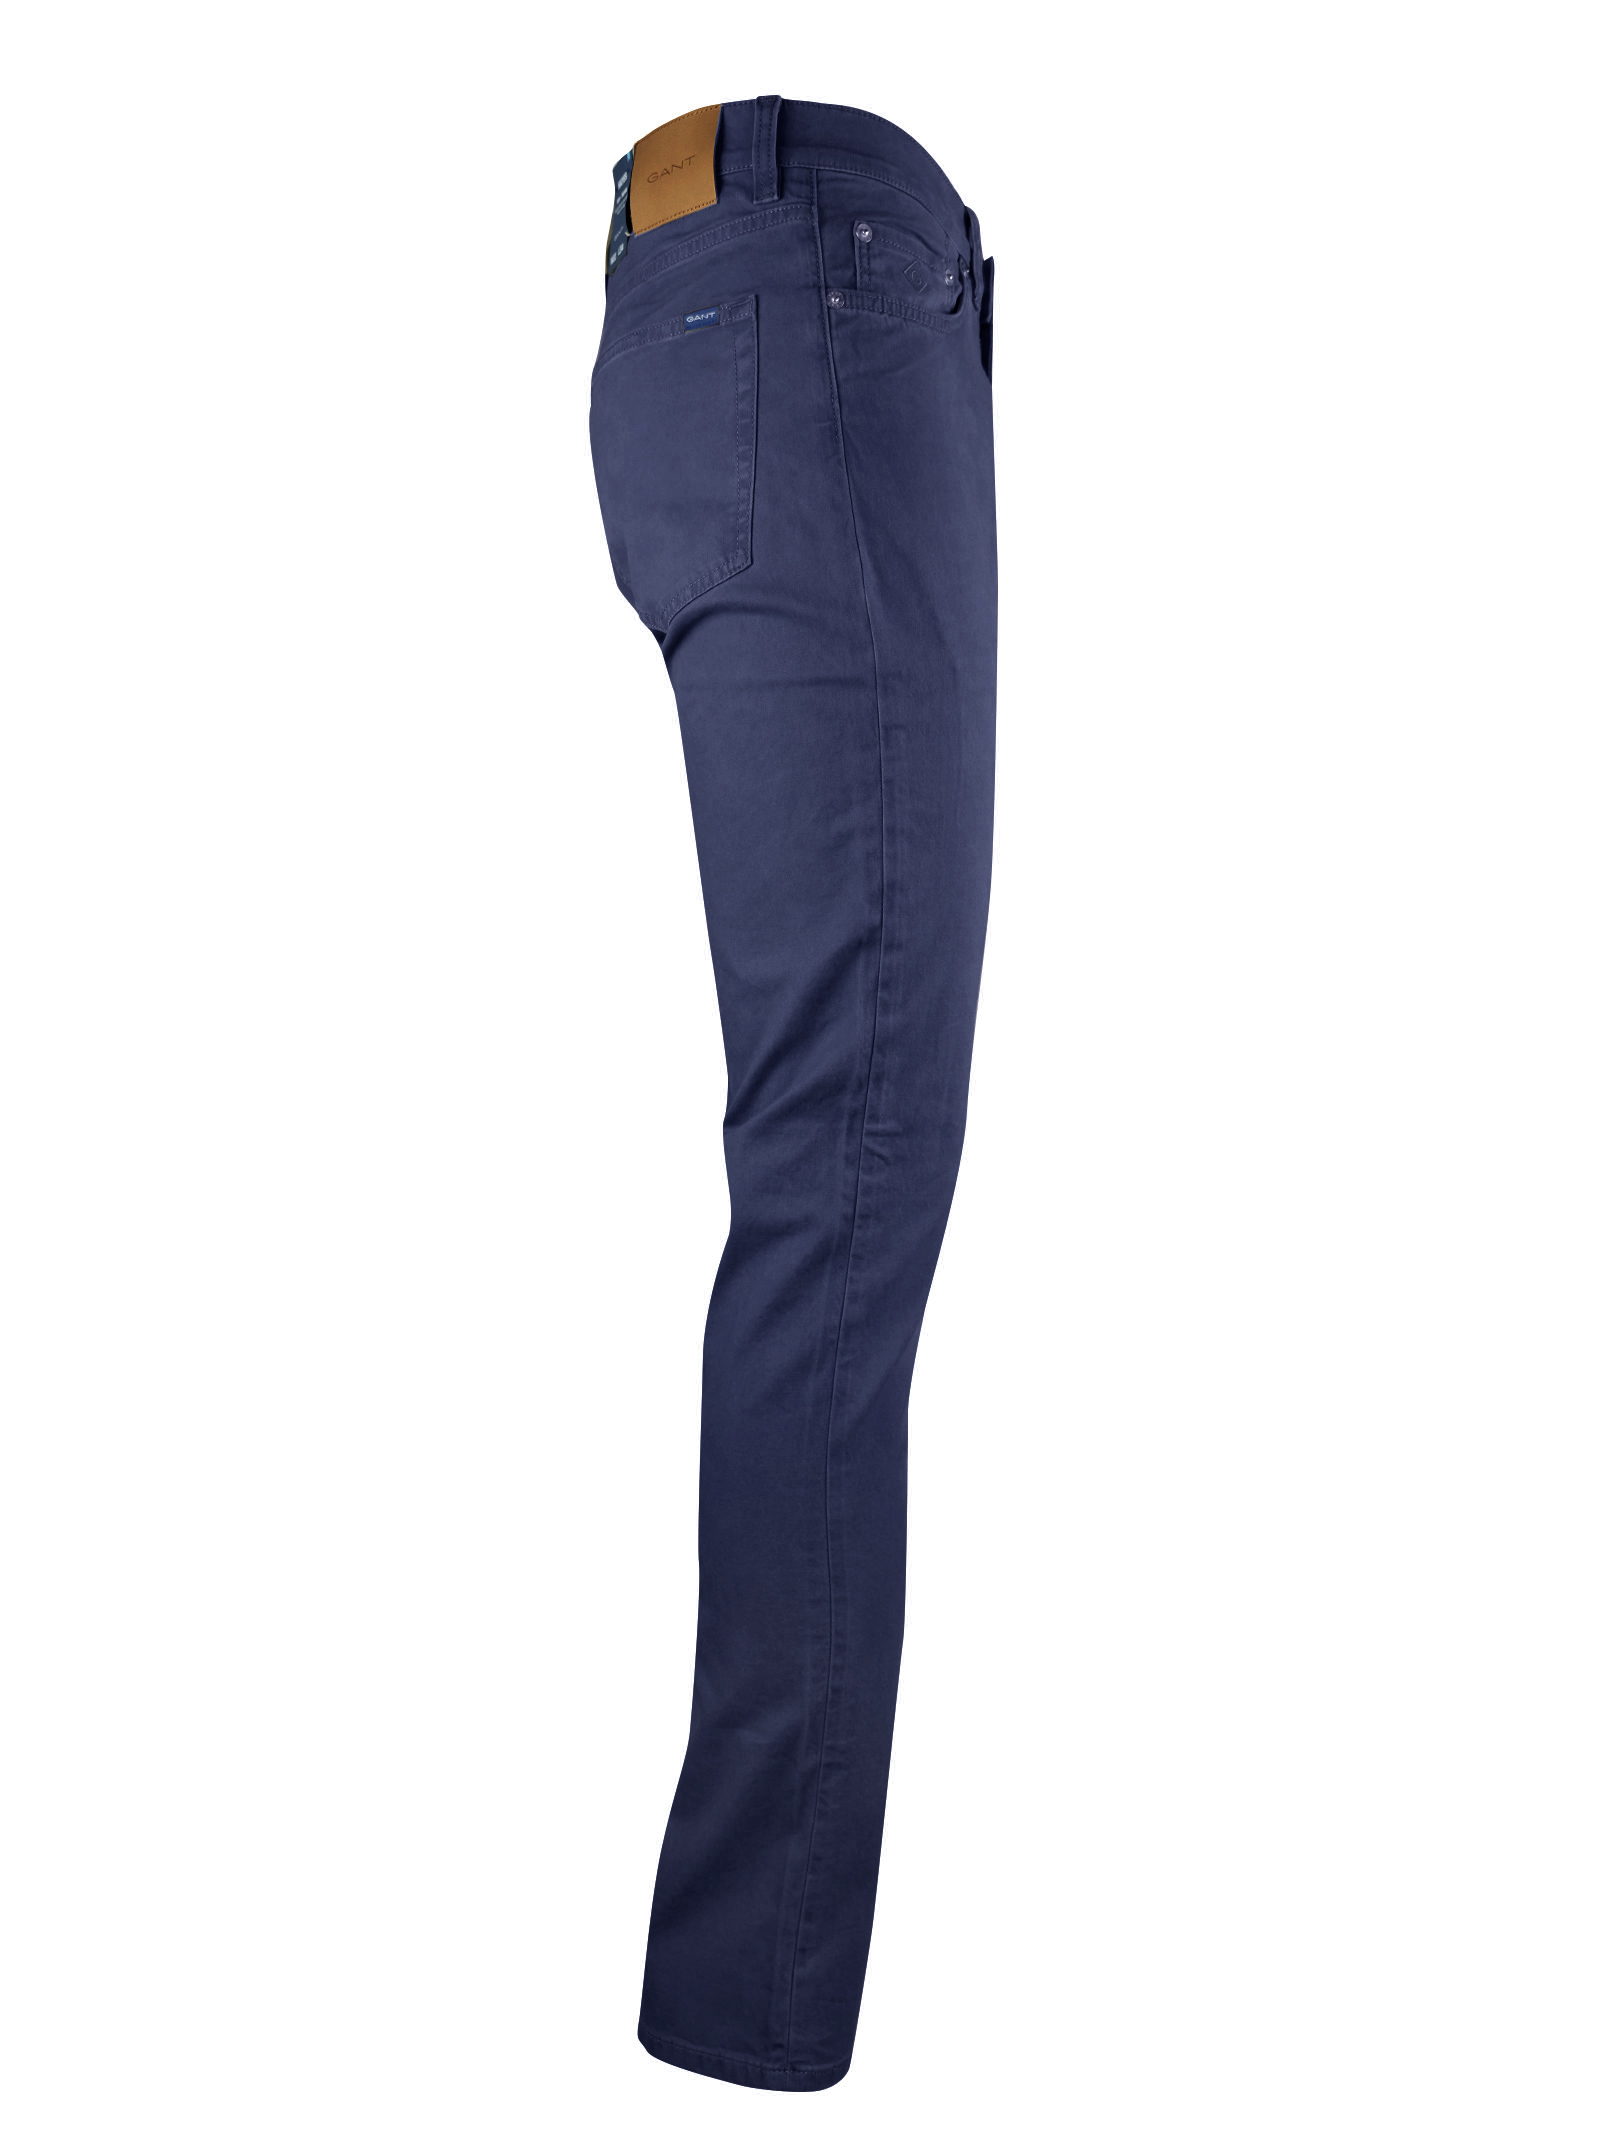 5 Pocket pants GANT | Trousers | 1000288410